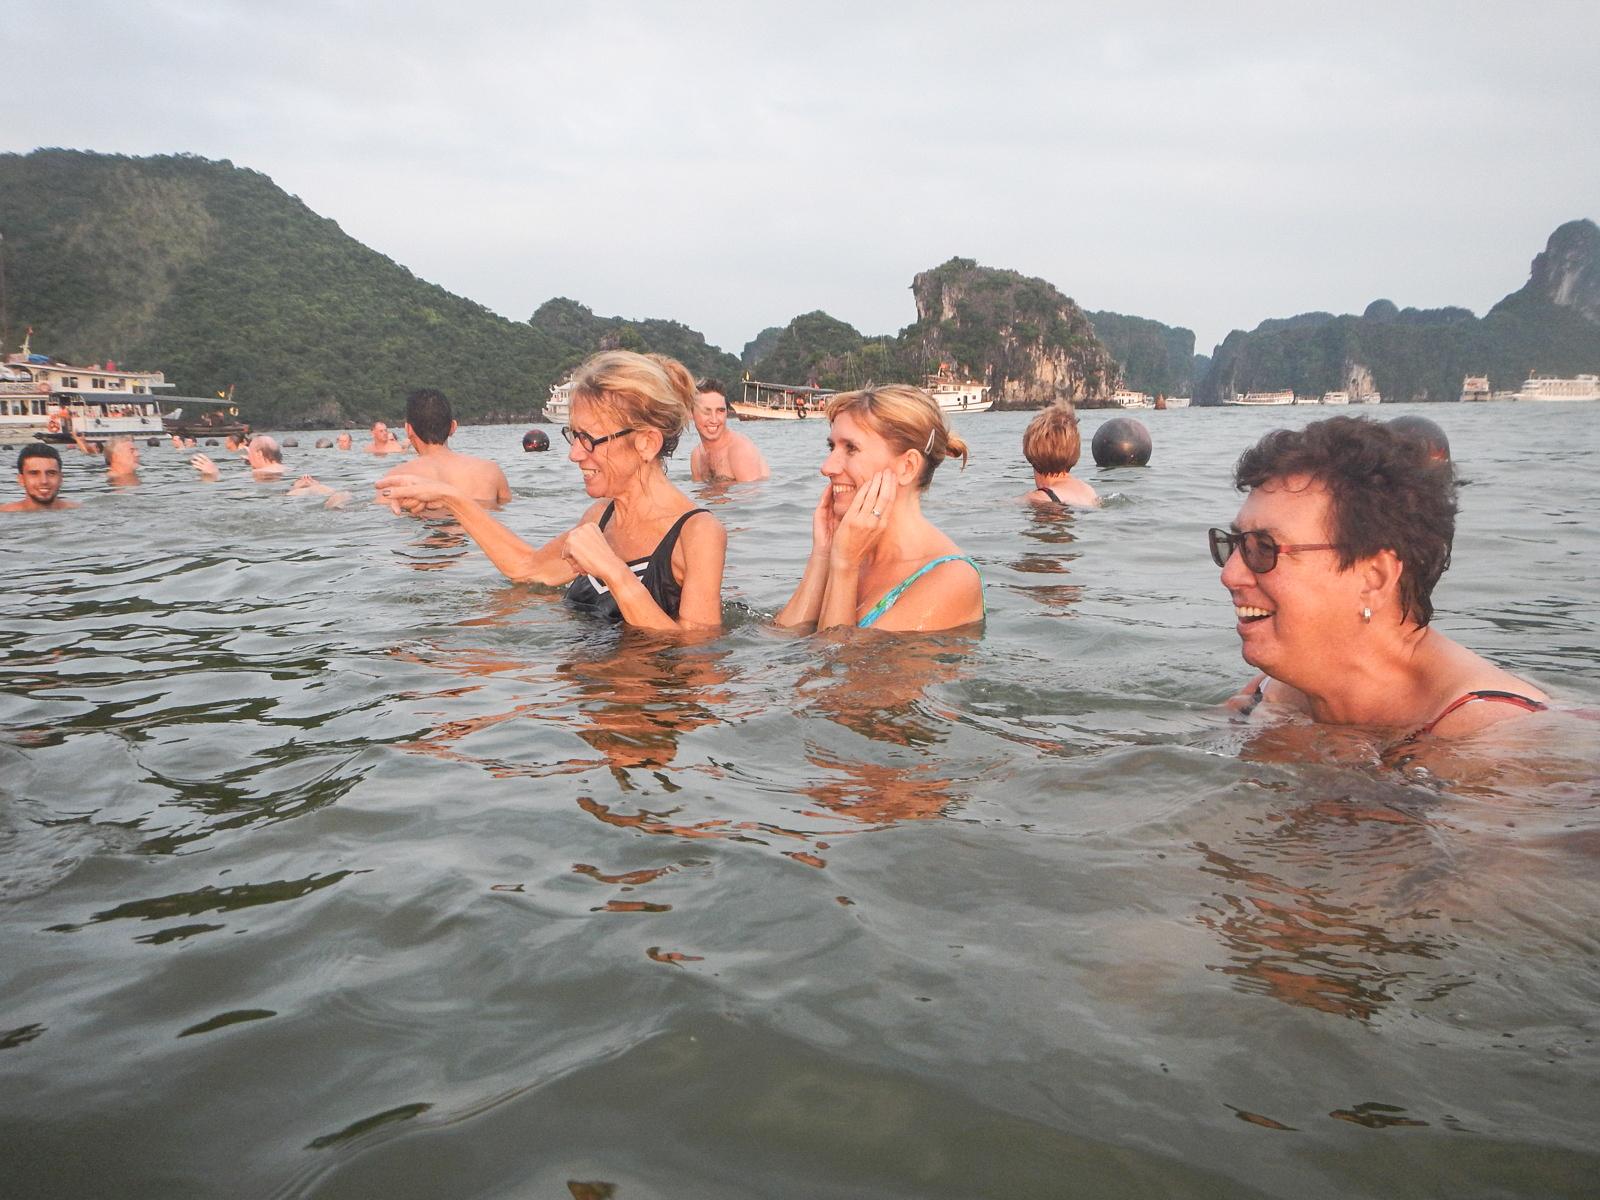 File:Swimming on beach Vietnam people jpg - Wikimedia Commons